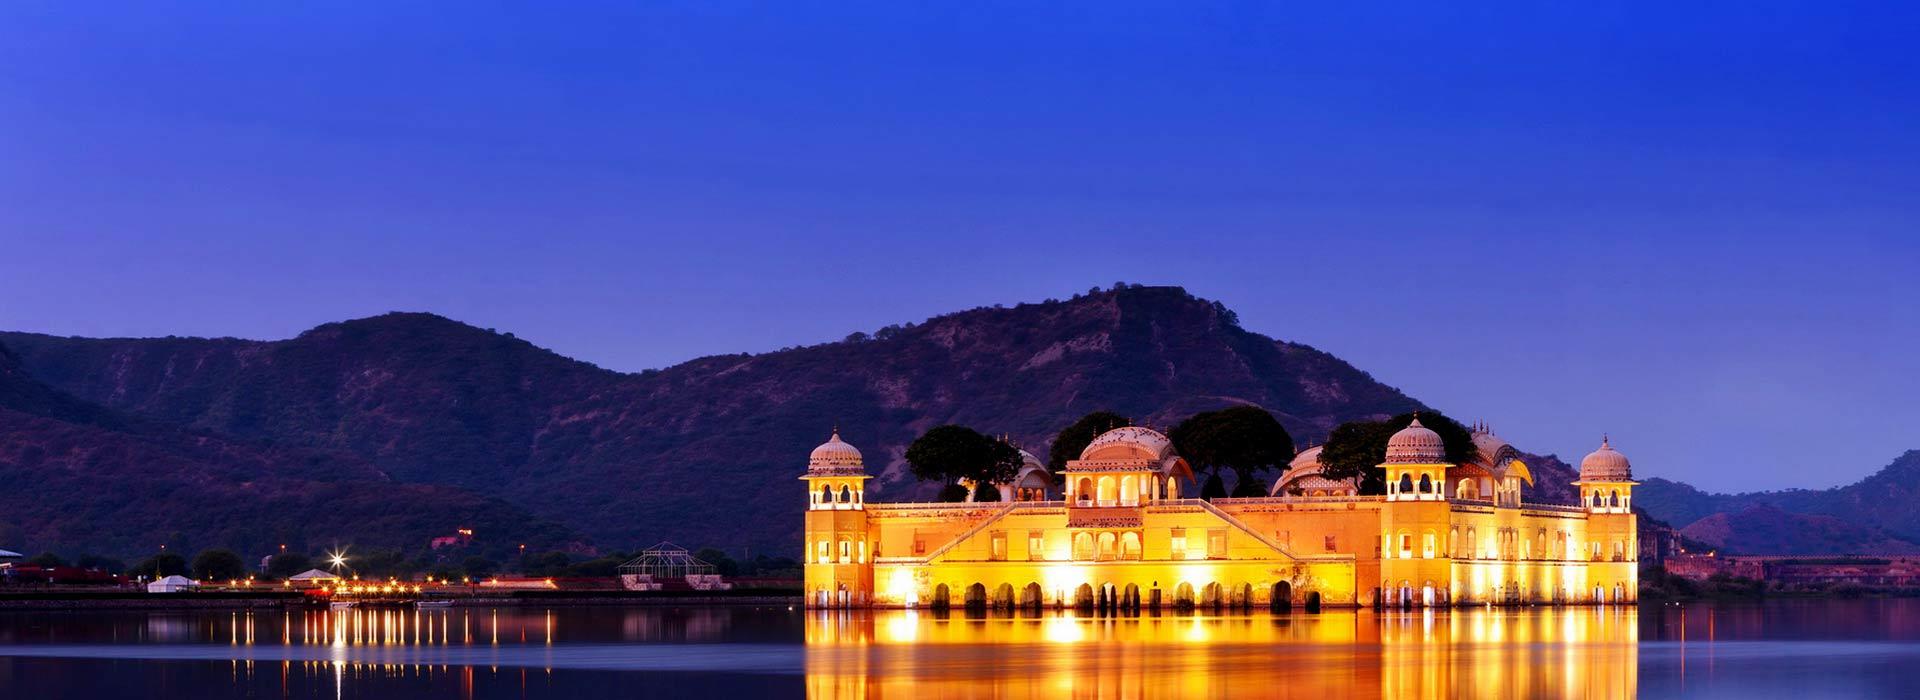 Jaipur-pink-city-tour